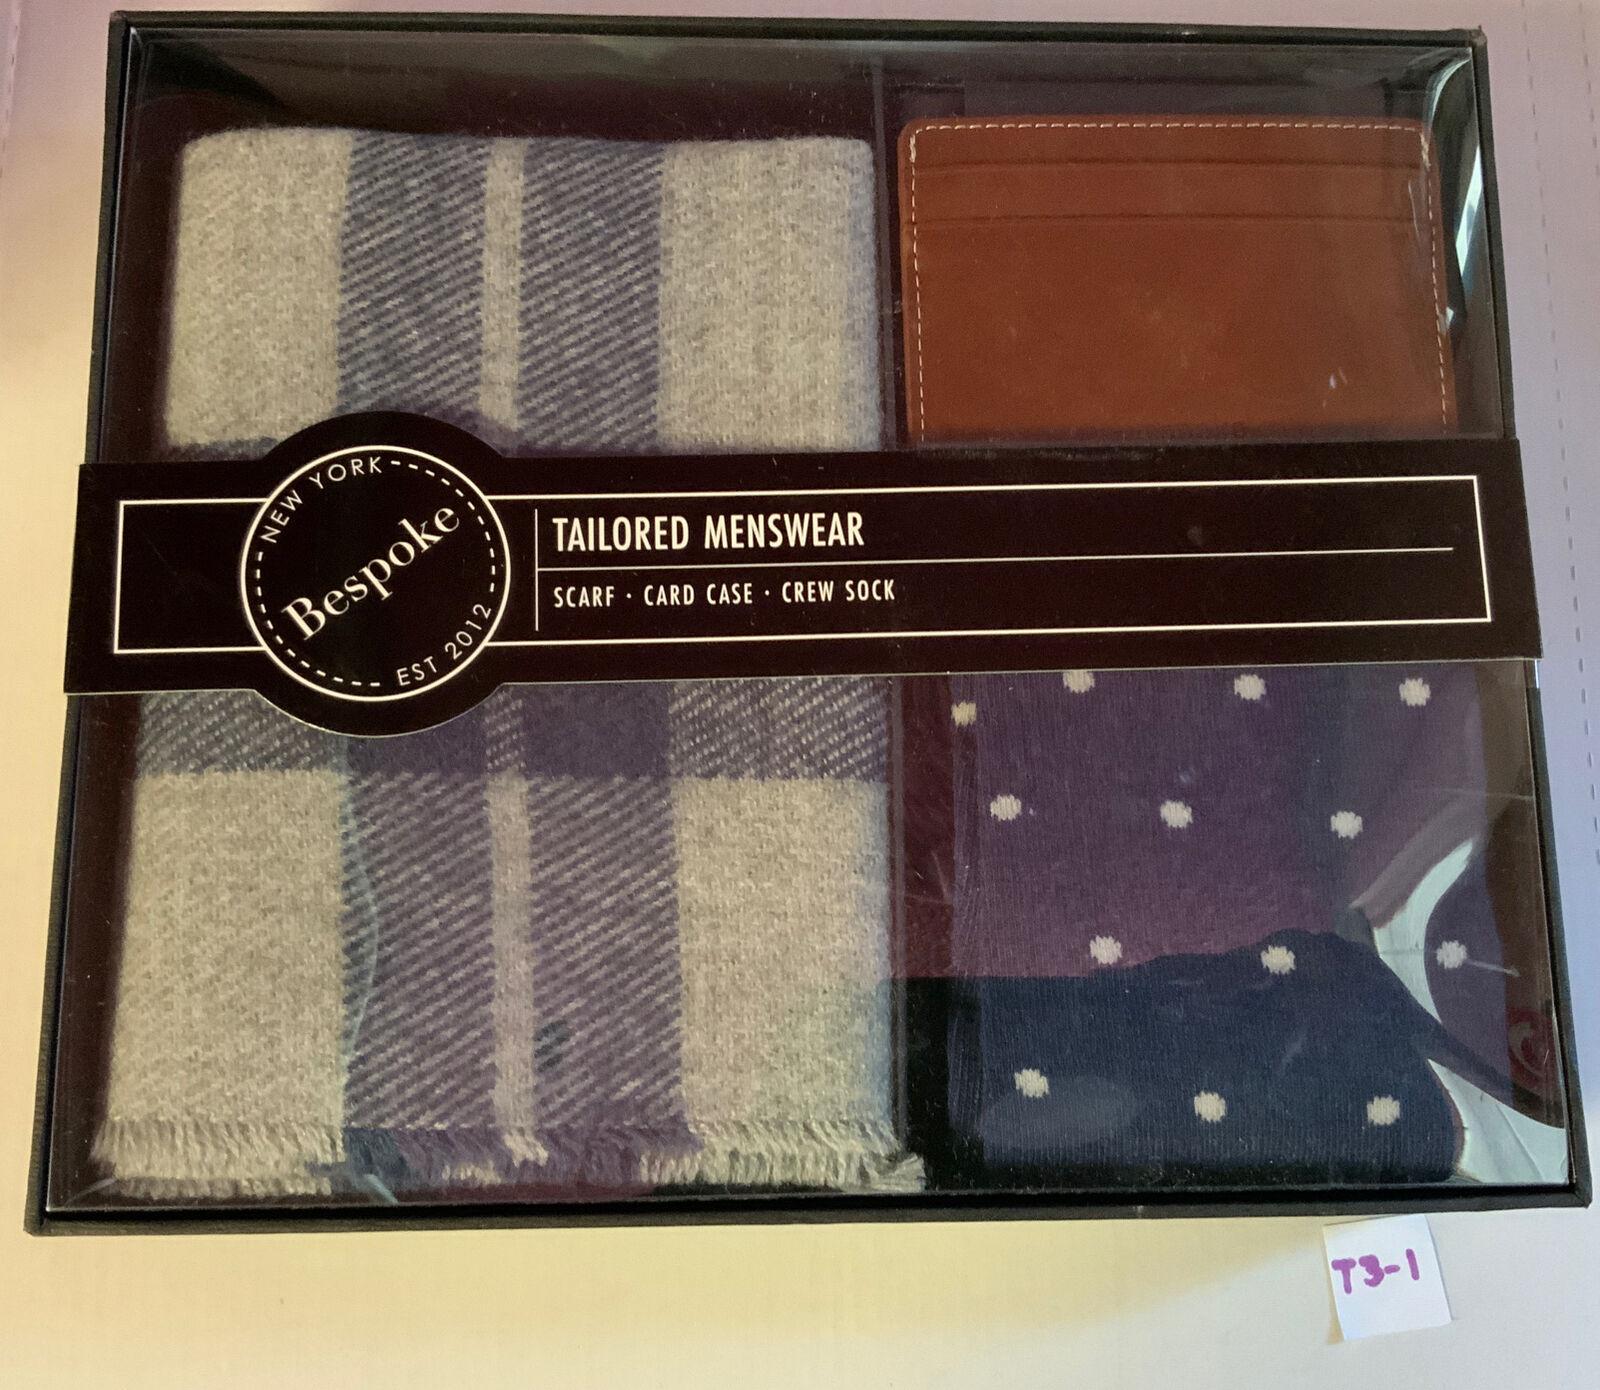 ✅ Bespoke Men's Dapper Box - Scarf Card Case Crew Socks,